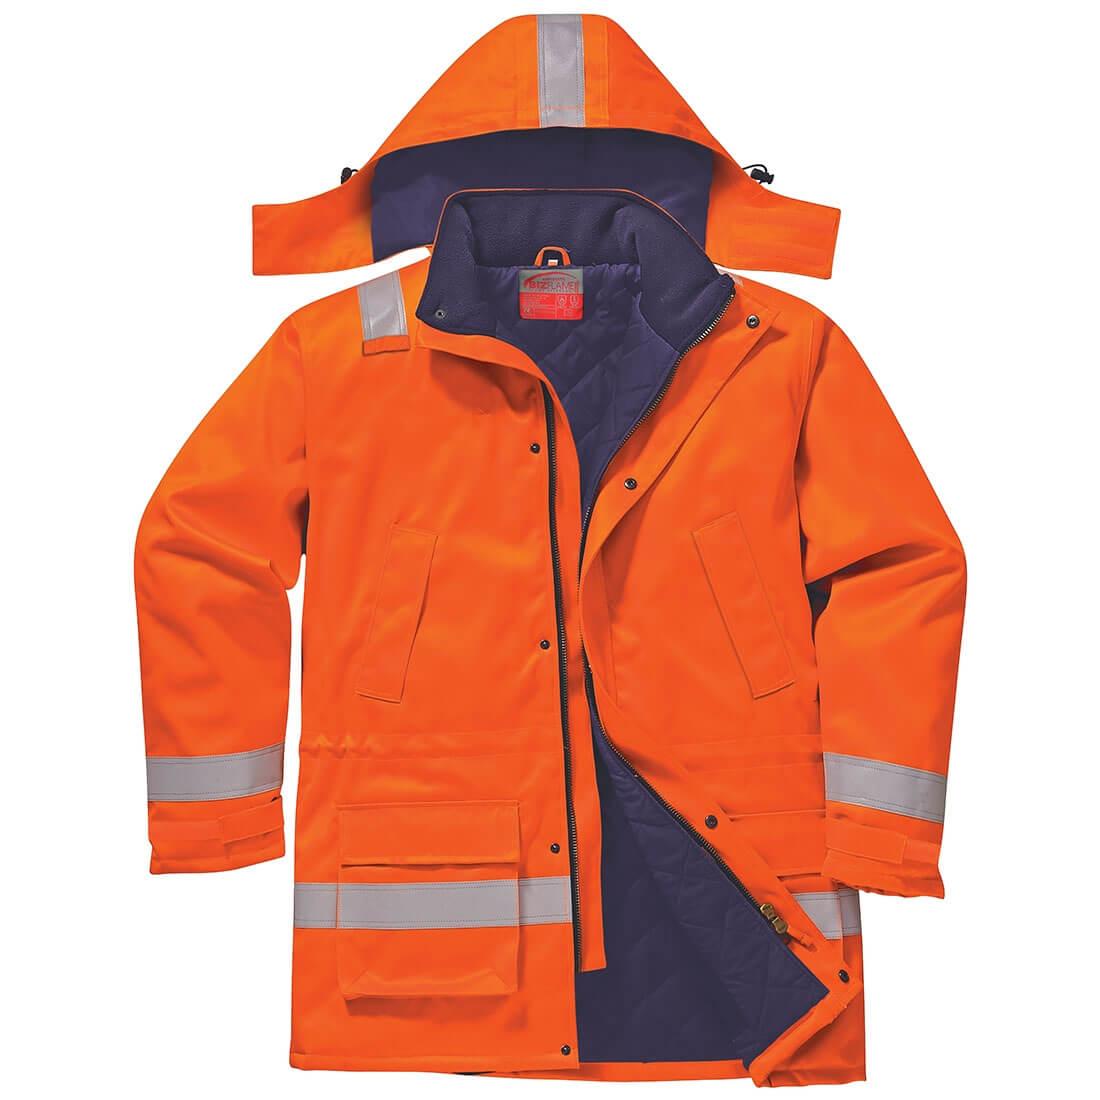 Jacheta de Iarna Ignifuga si Antistatica - Imbracaminte de protectie